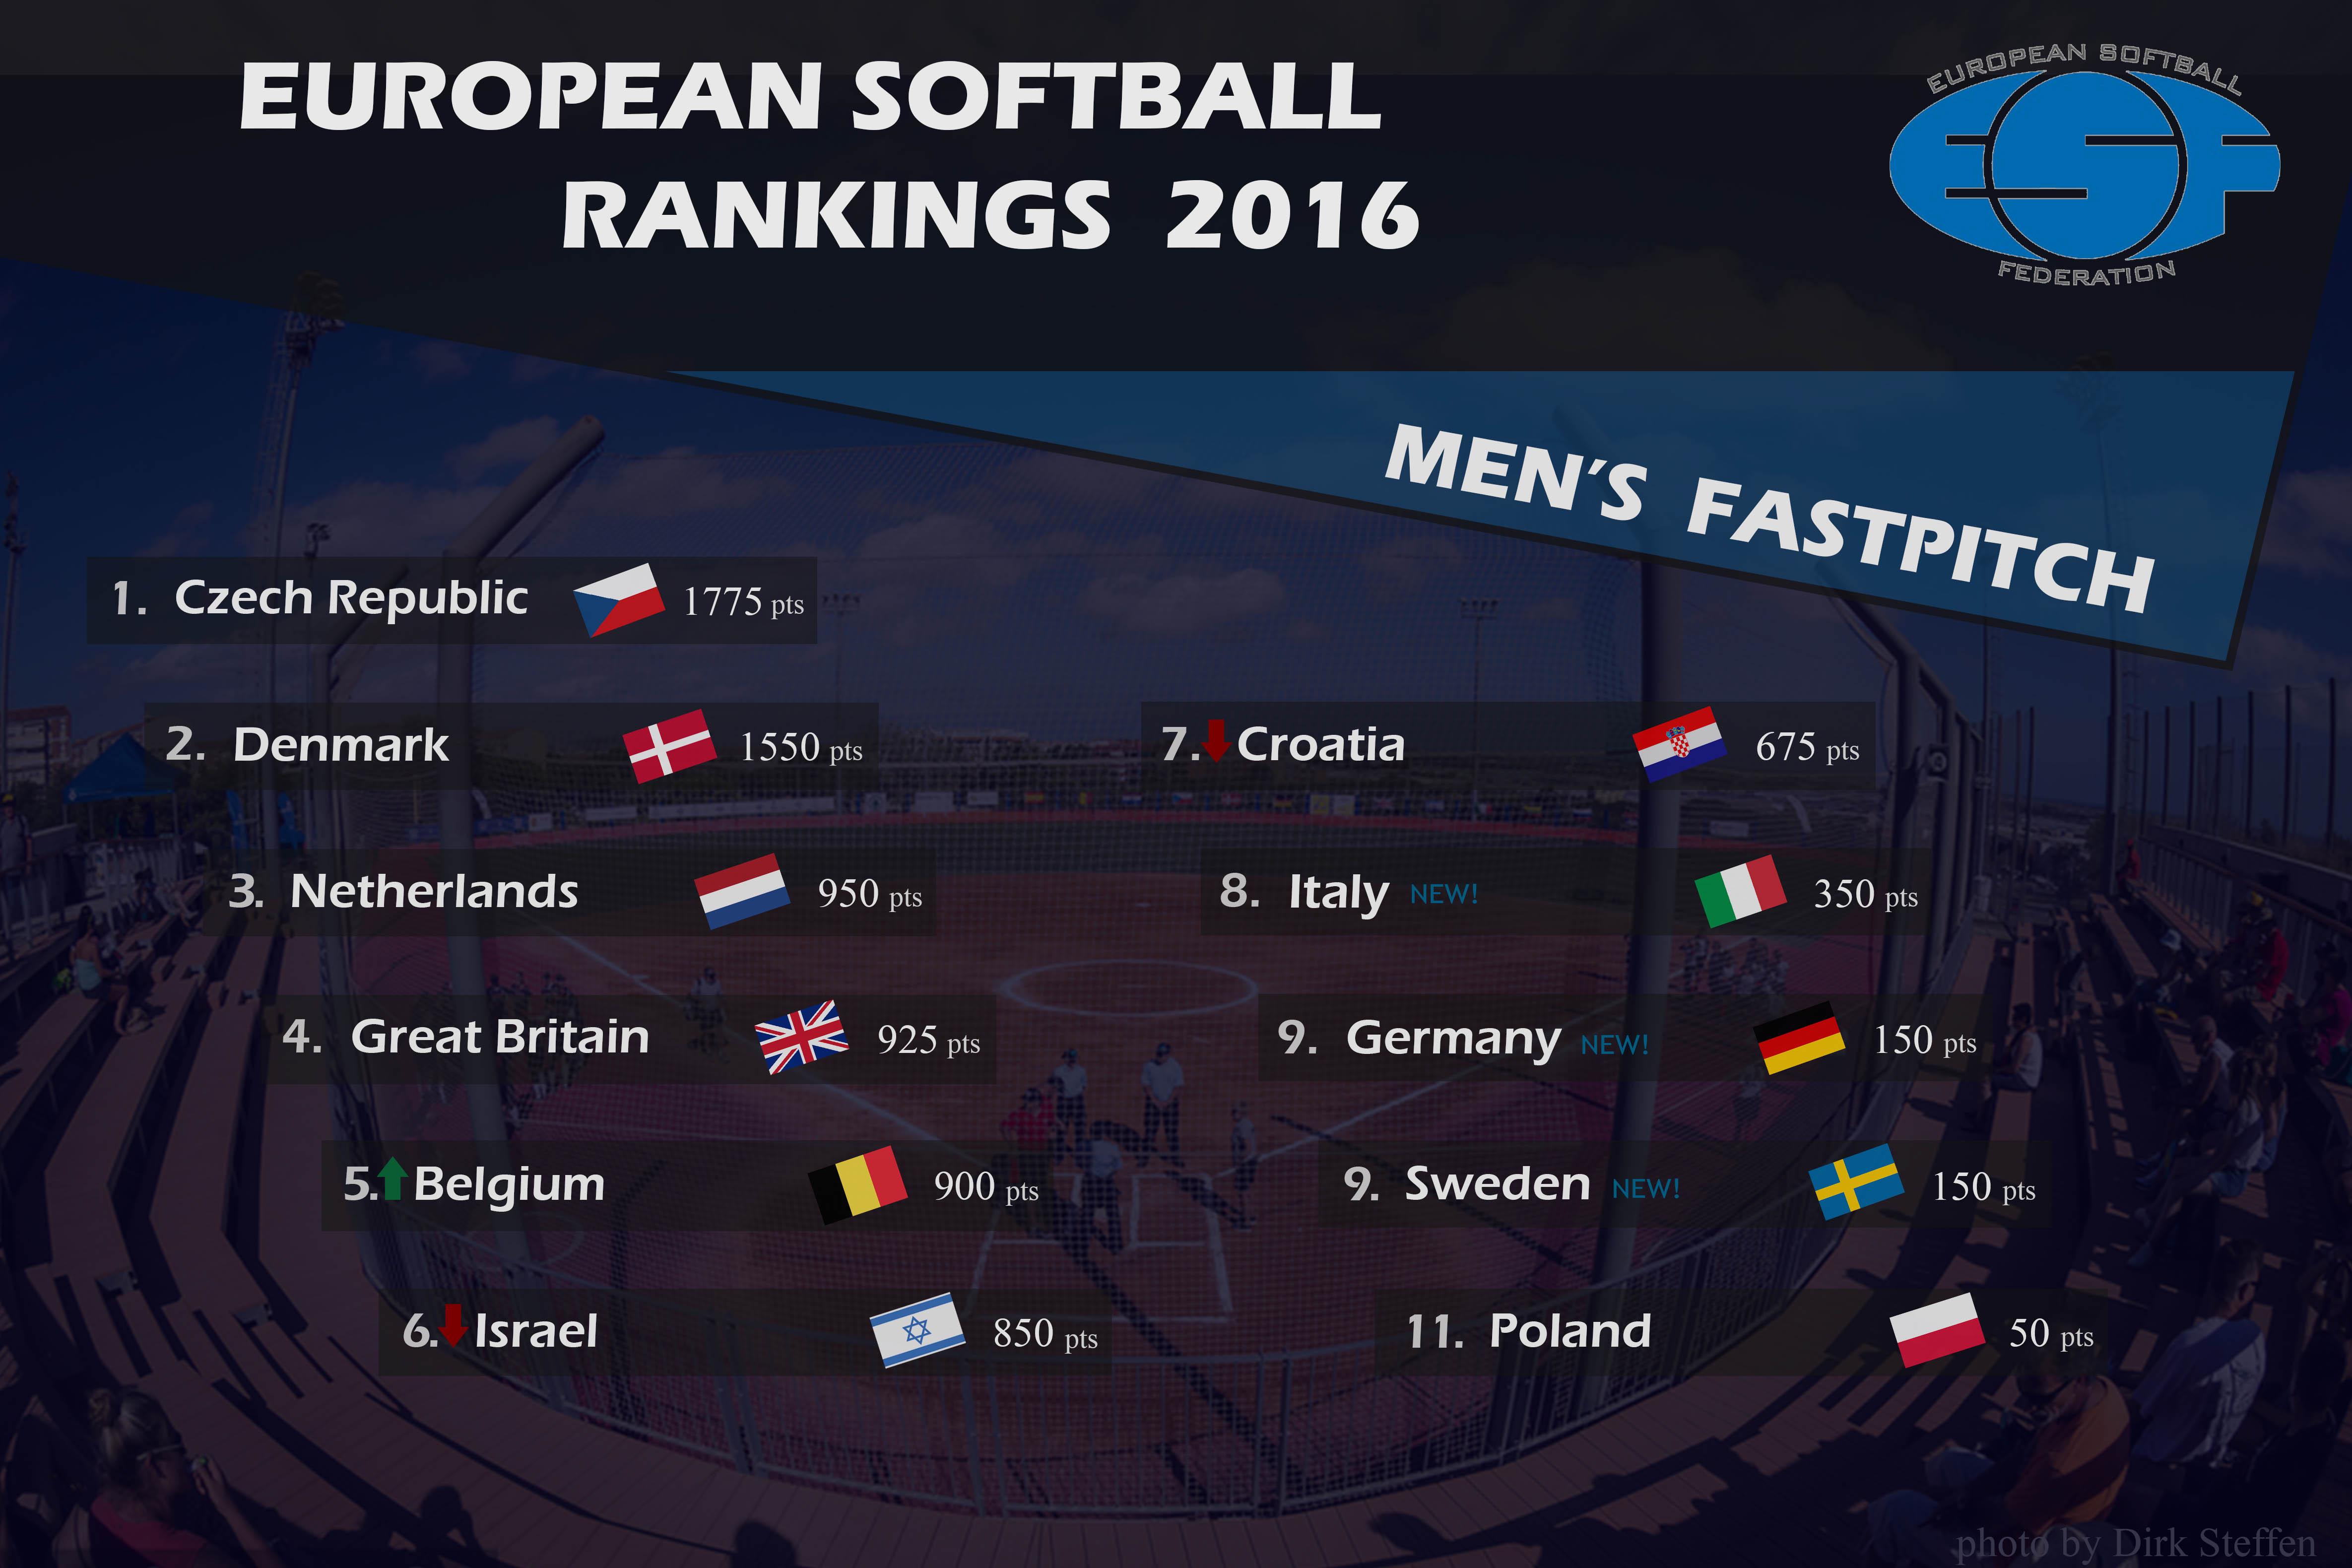 European Softball Federation updates European Softball